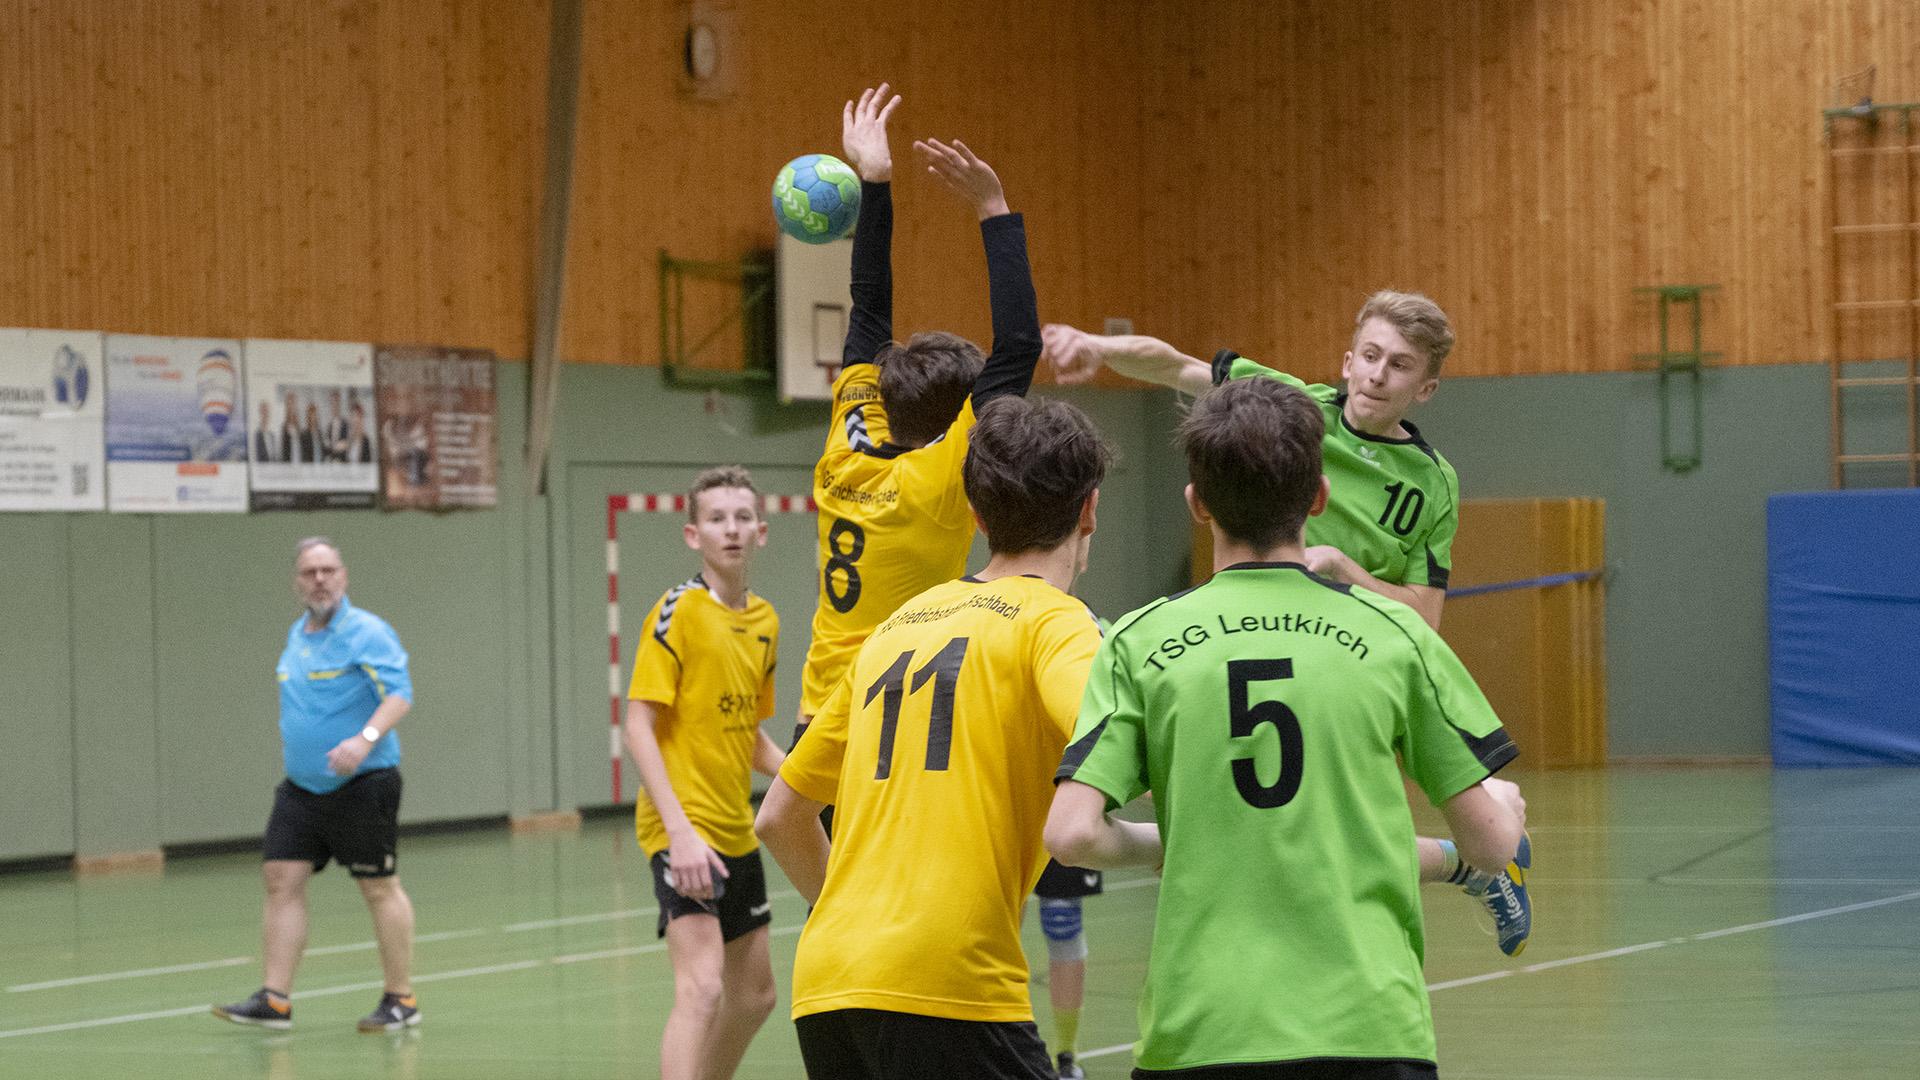 085Slider_mB_tsg_leutkirch_handball